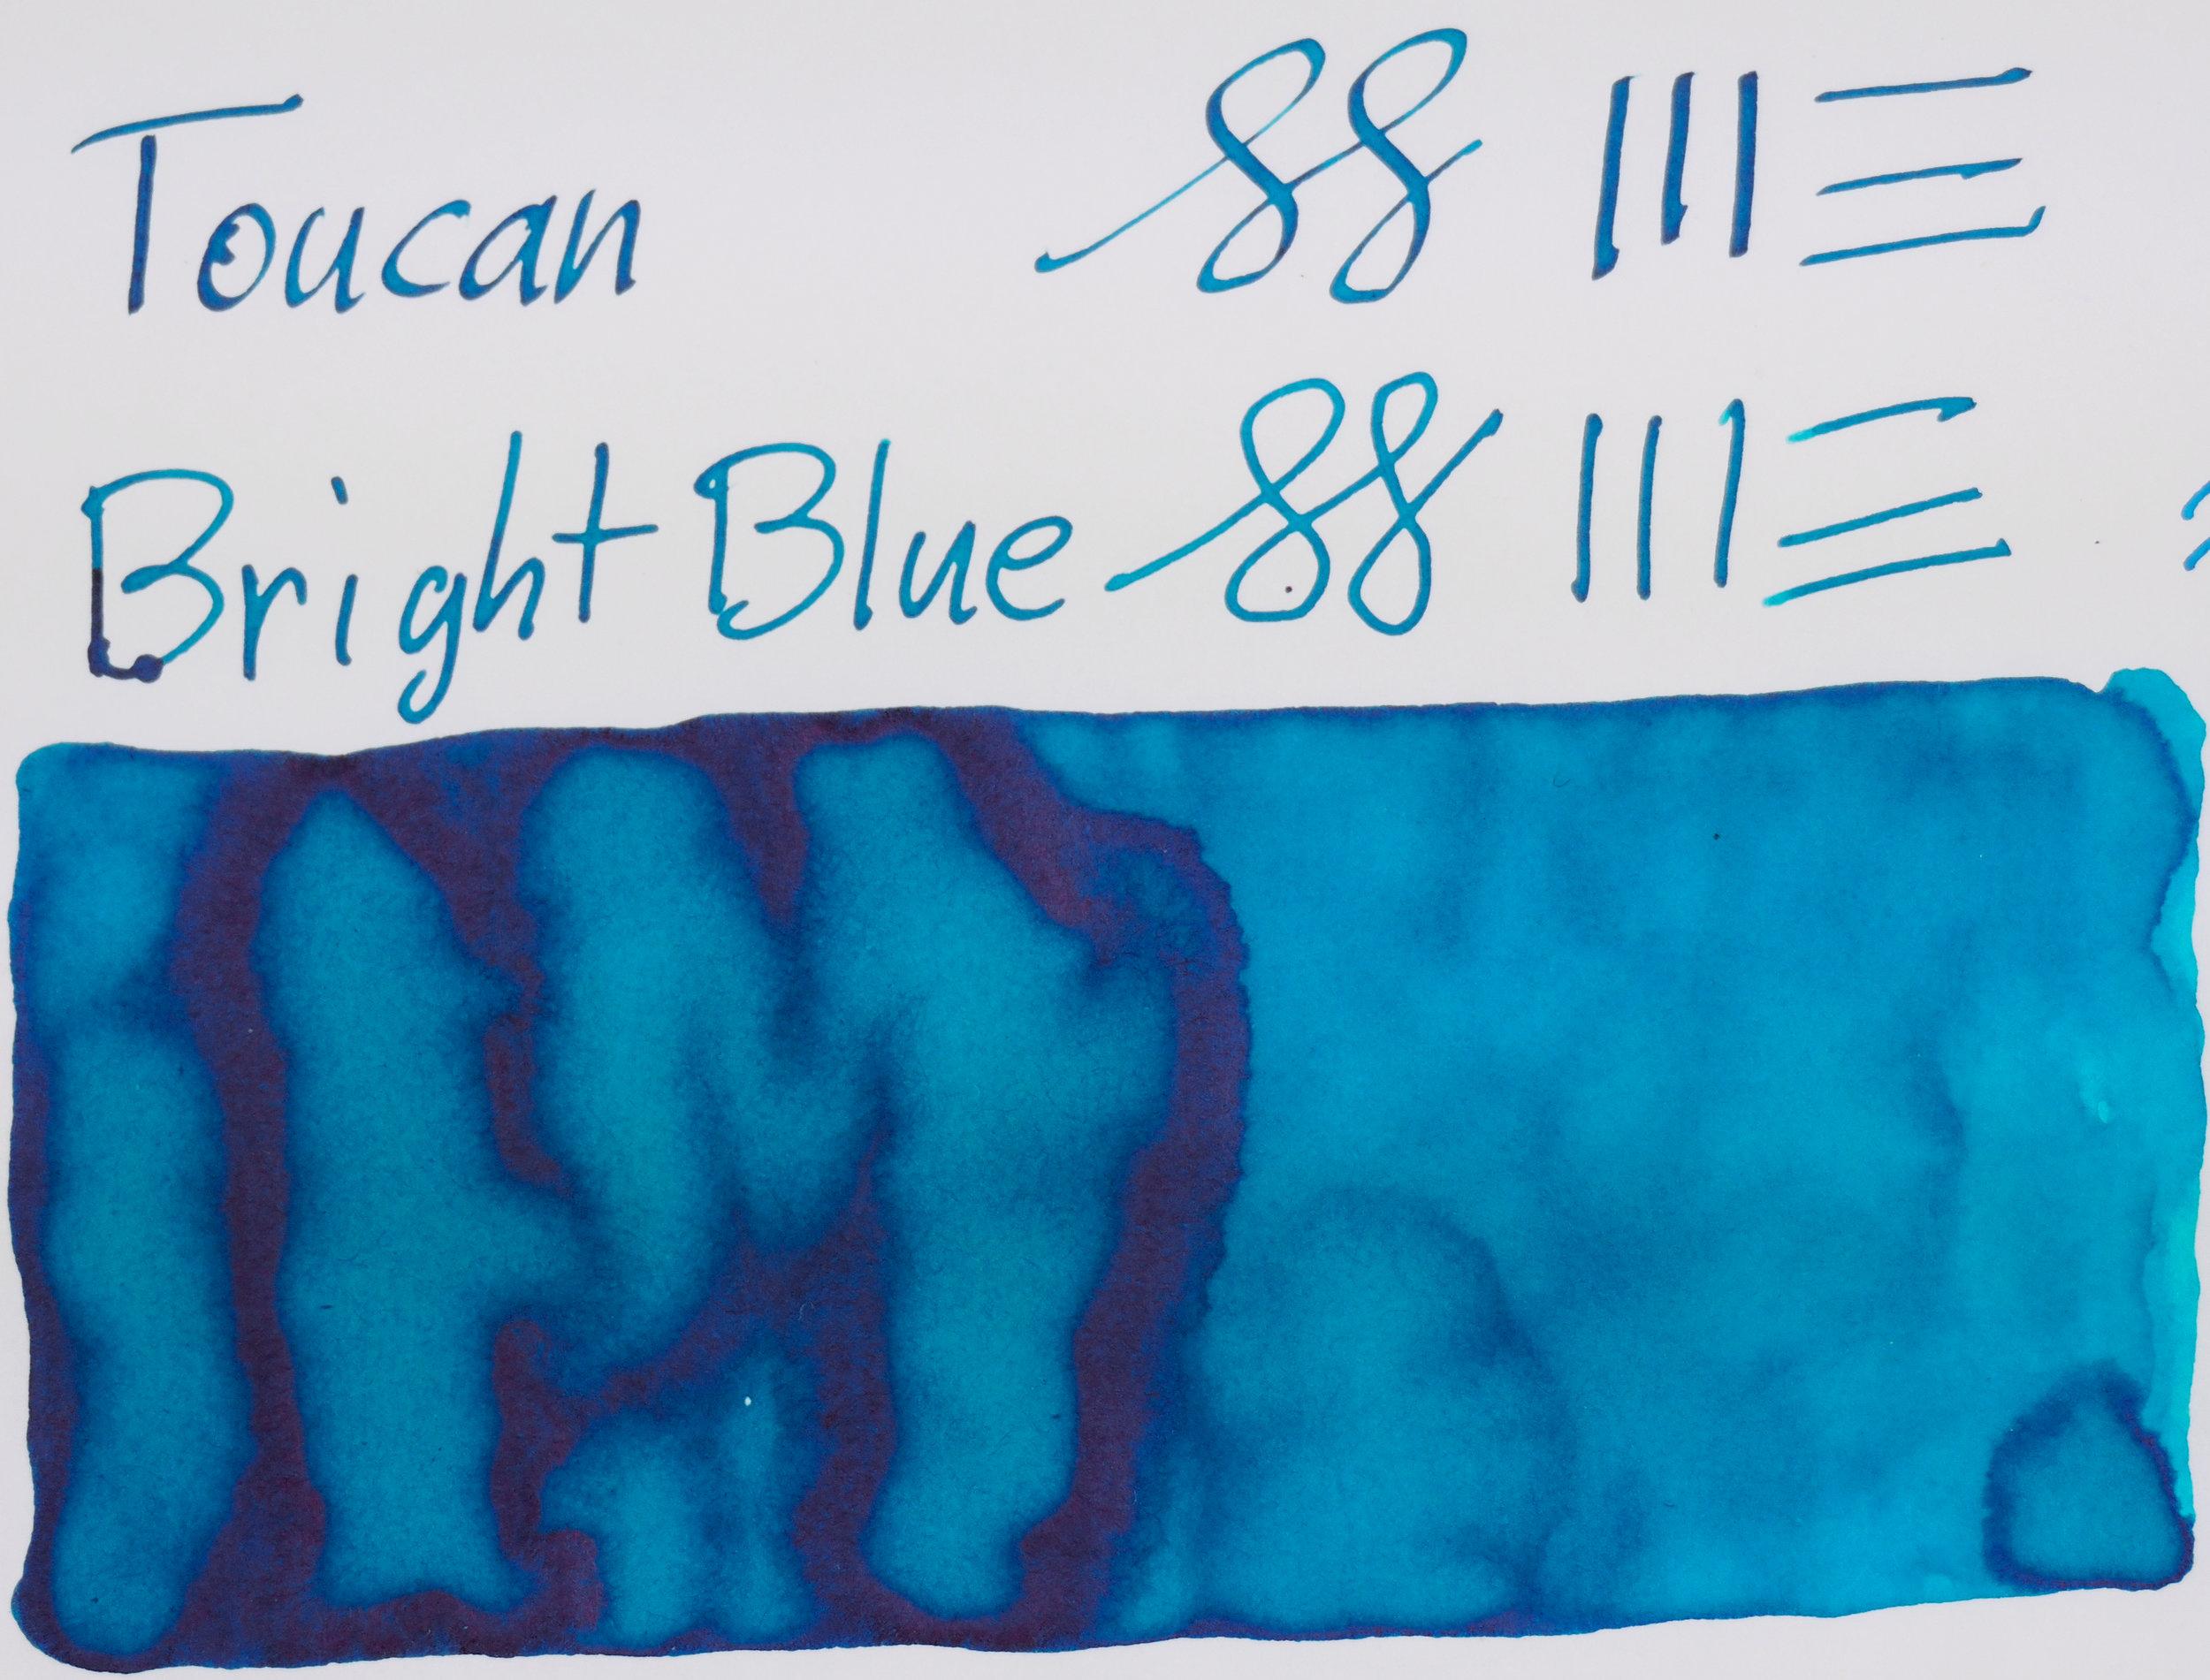 Tomoe River Toucan Bright Blue.jpg